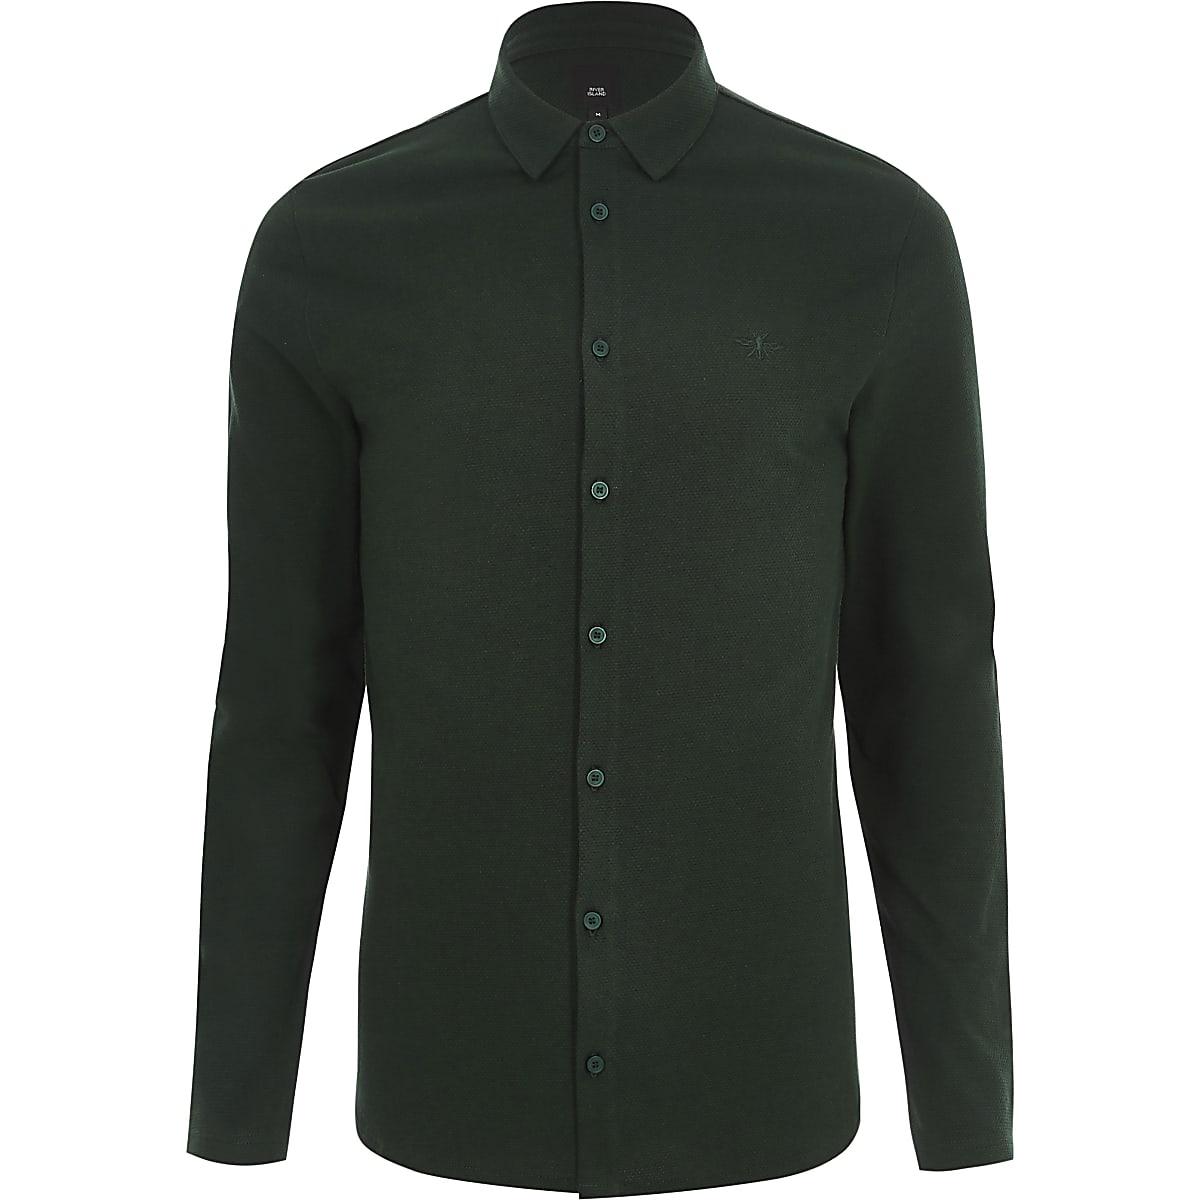 c9e6347c Dark green muscle fit long sleeve shirt - Long Sleeve Shirts ...